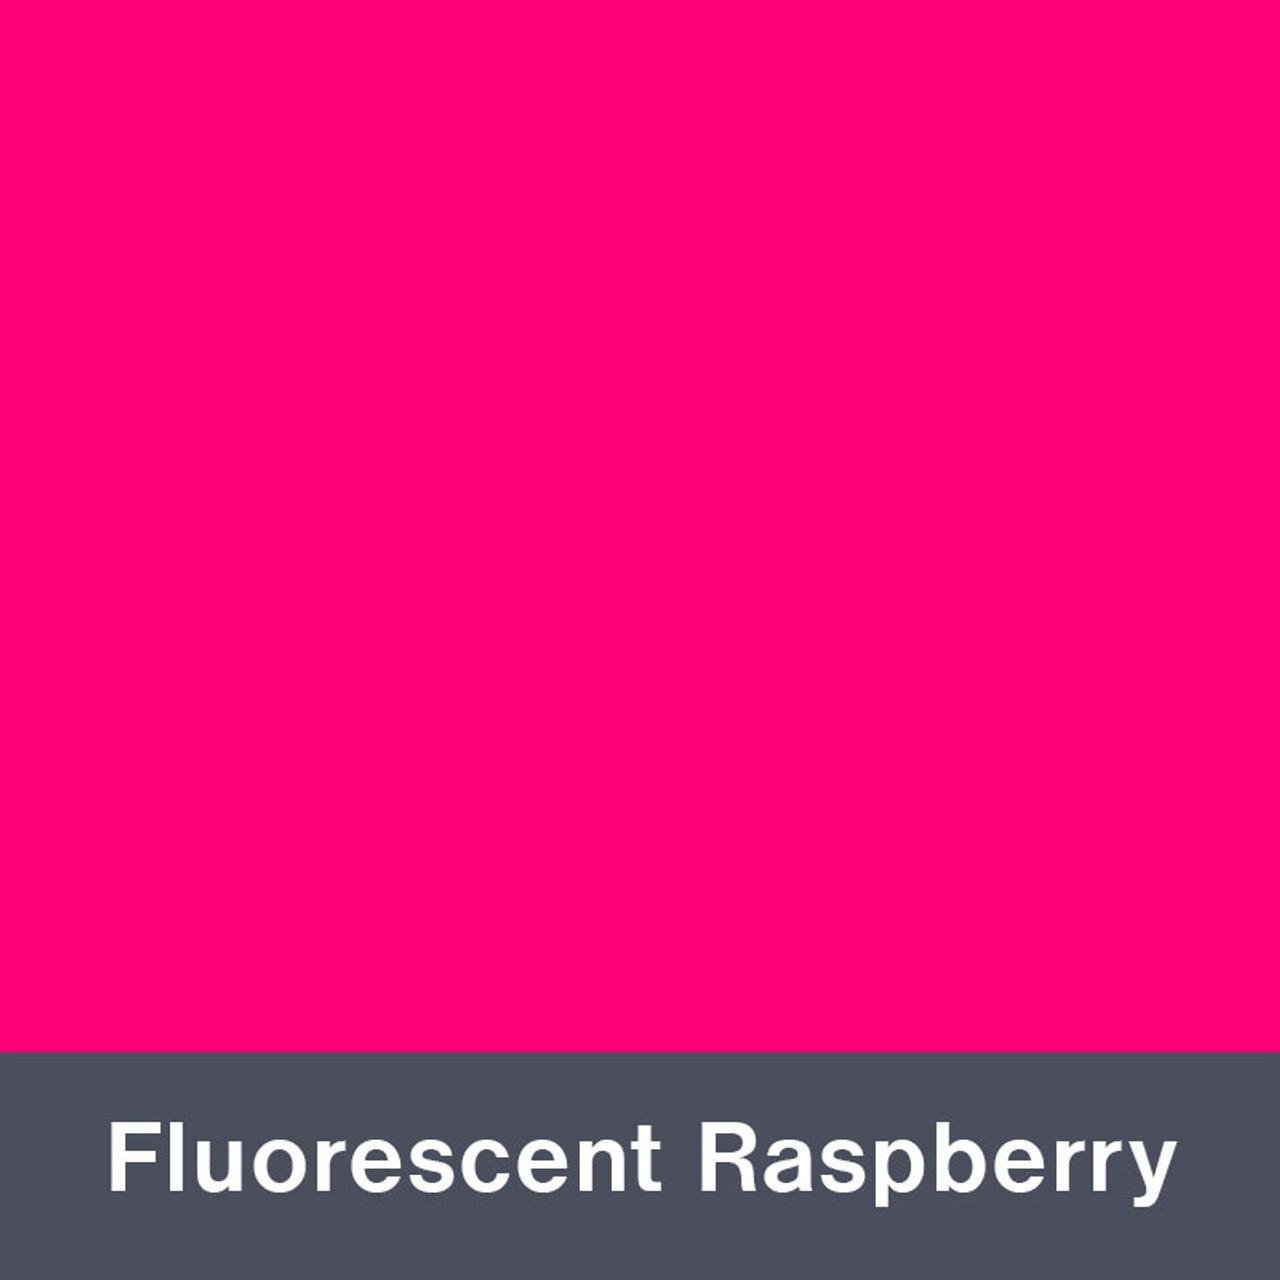 "Iron-on Fluorescent Raspberry 12"" x 14.75"""